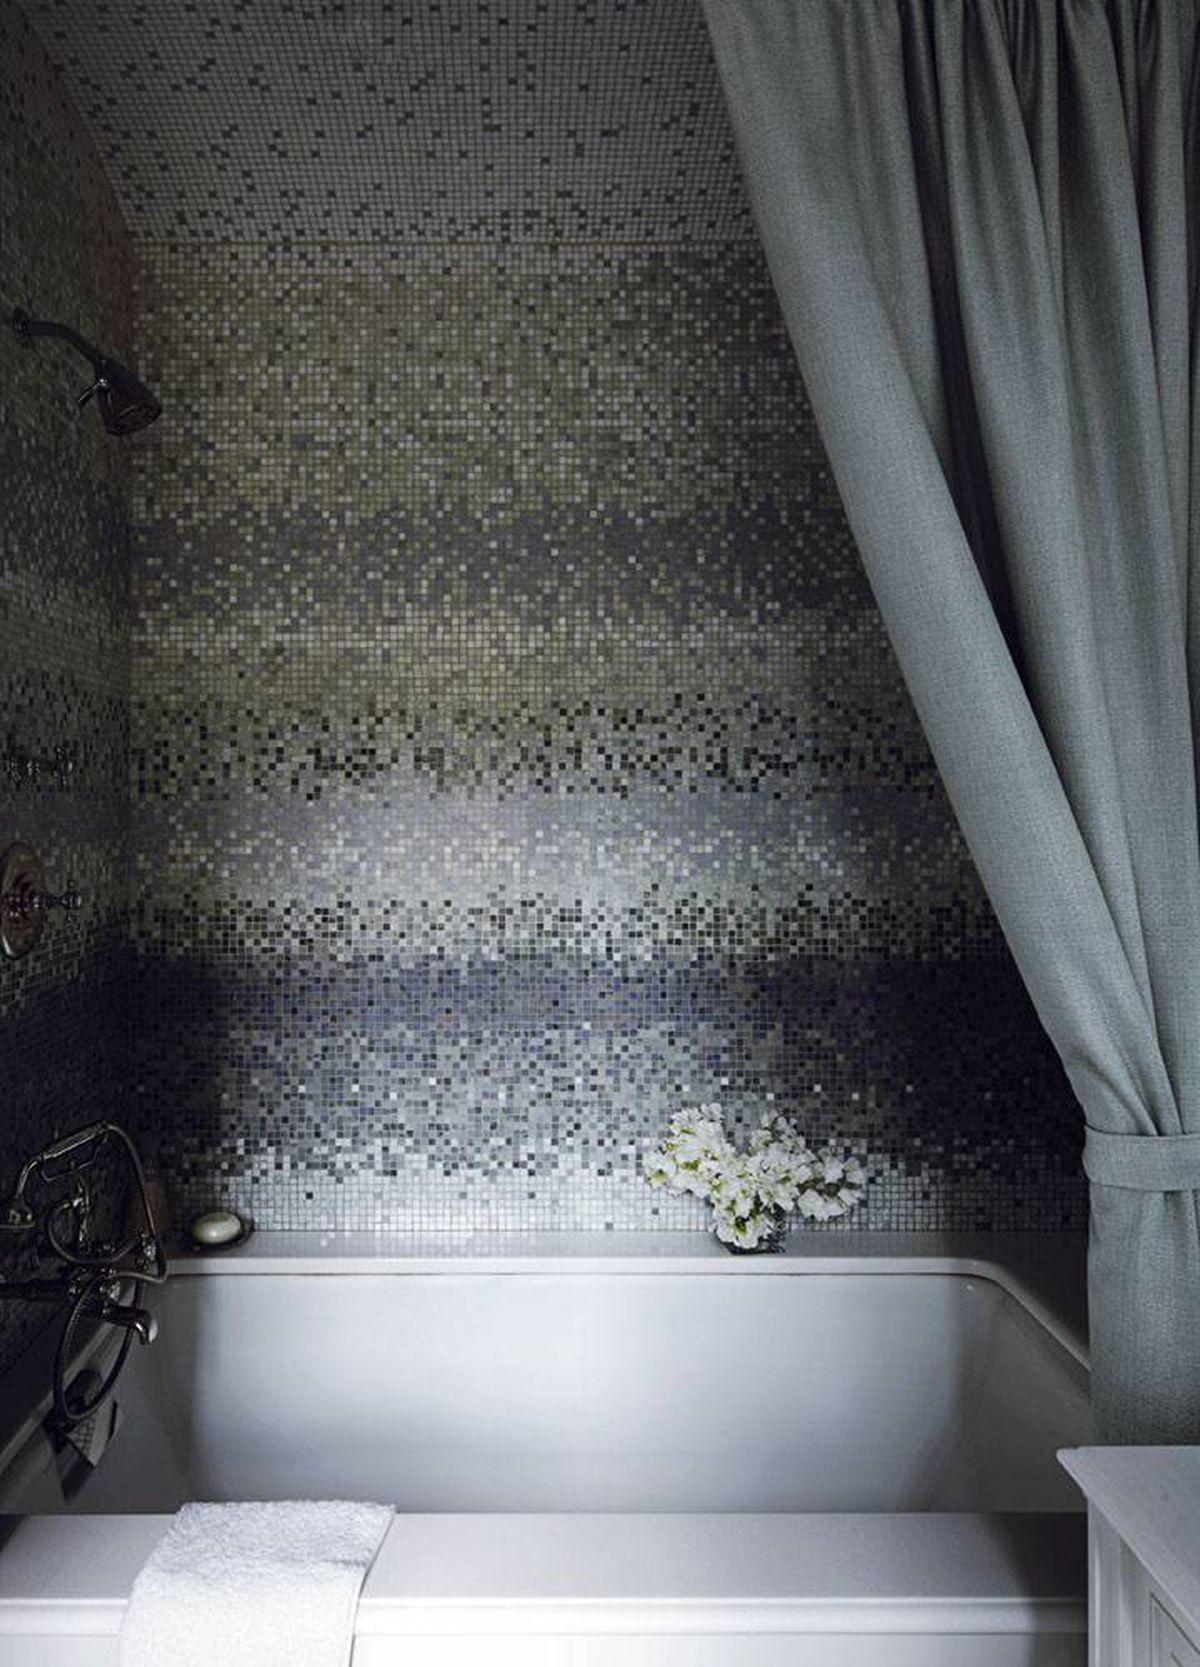 Interiors by Sandra Nunnerley, Powerhouse Books, 2013